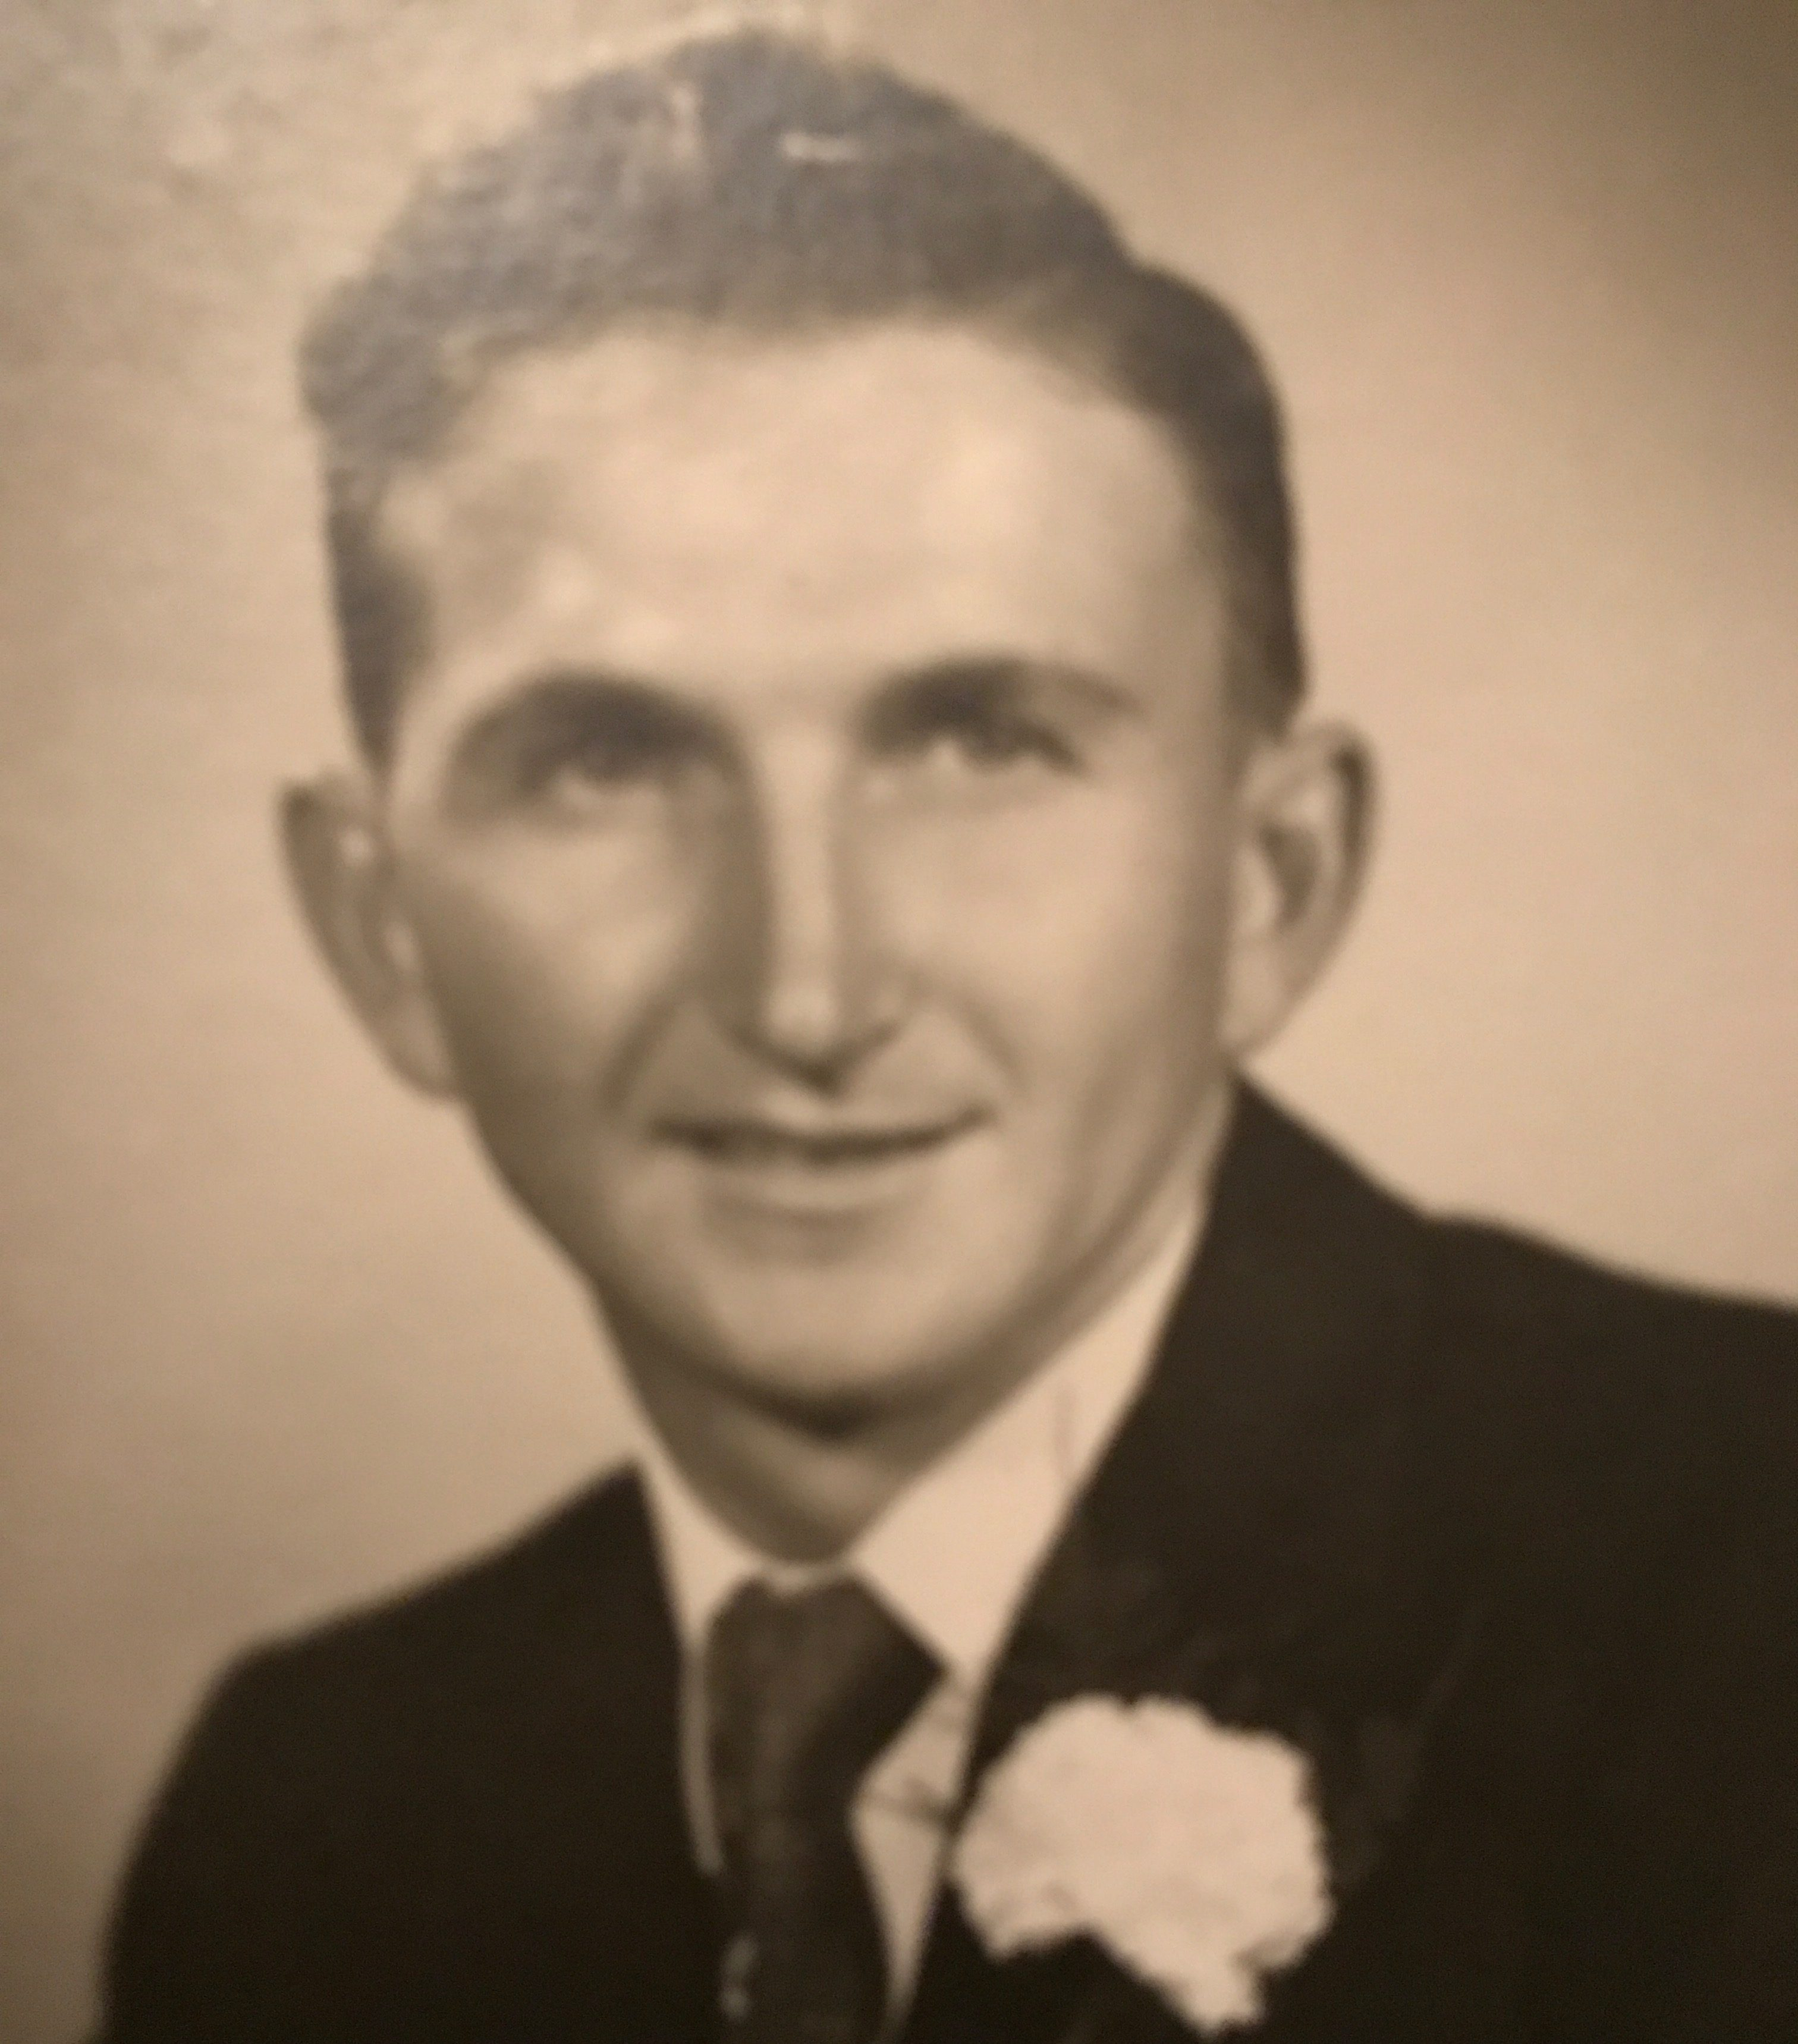 Wayne Lee Murphy Maddox Funeral Home